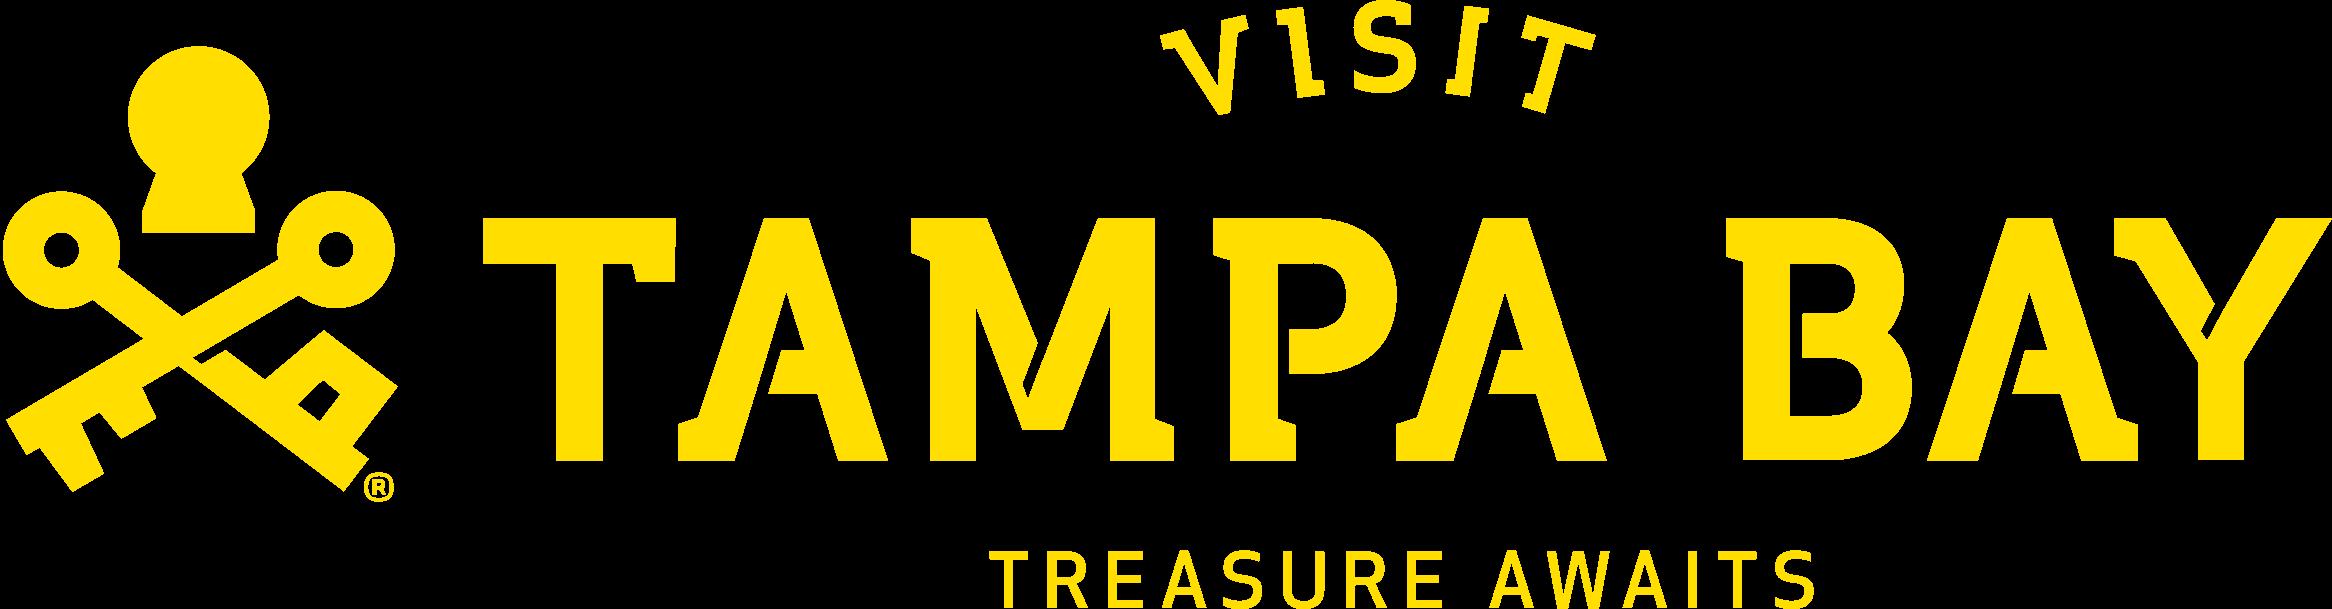 logo-visittampabay-min